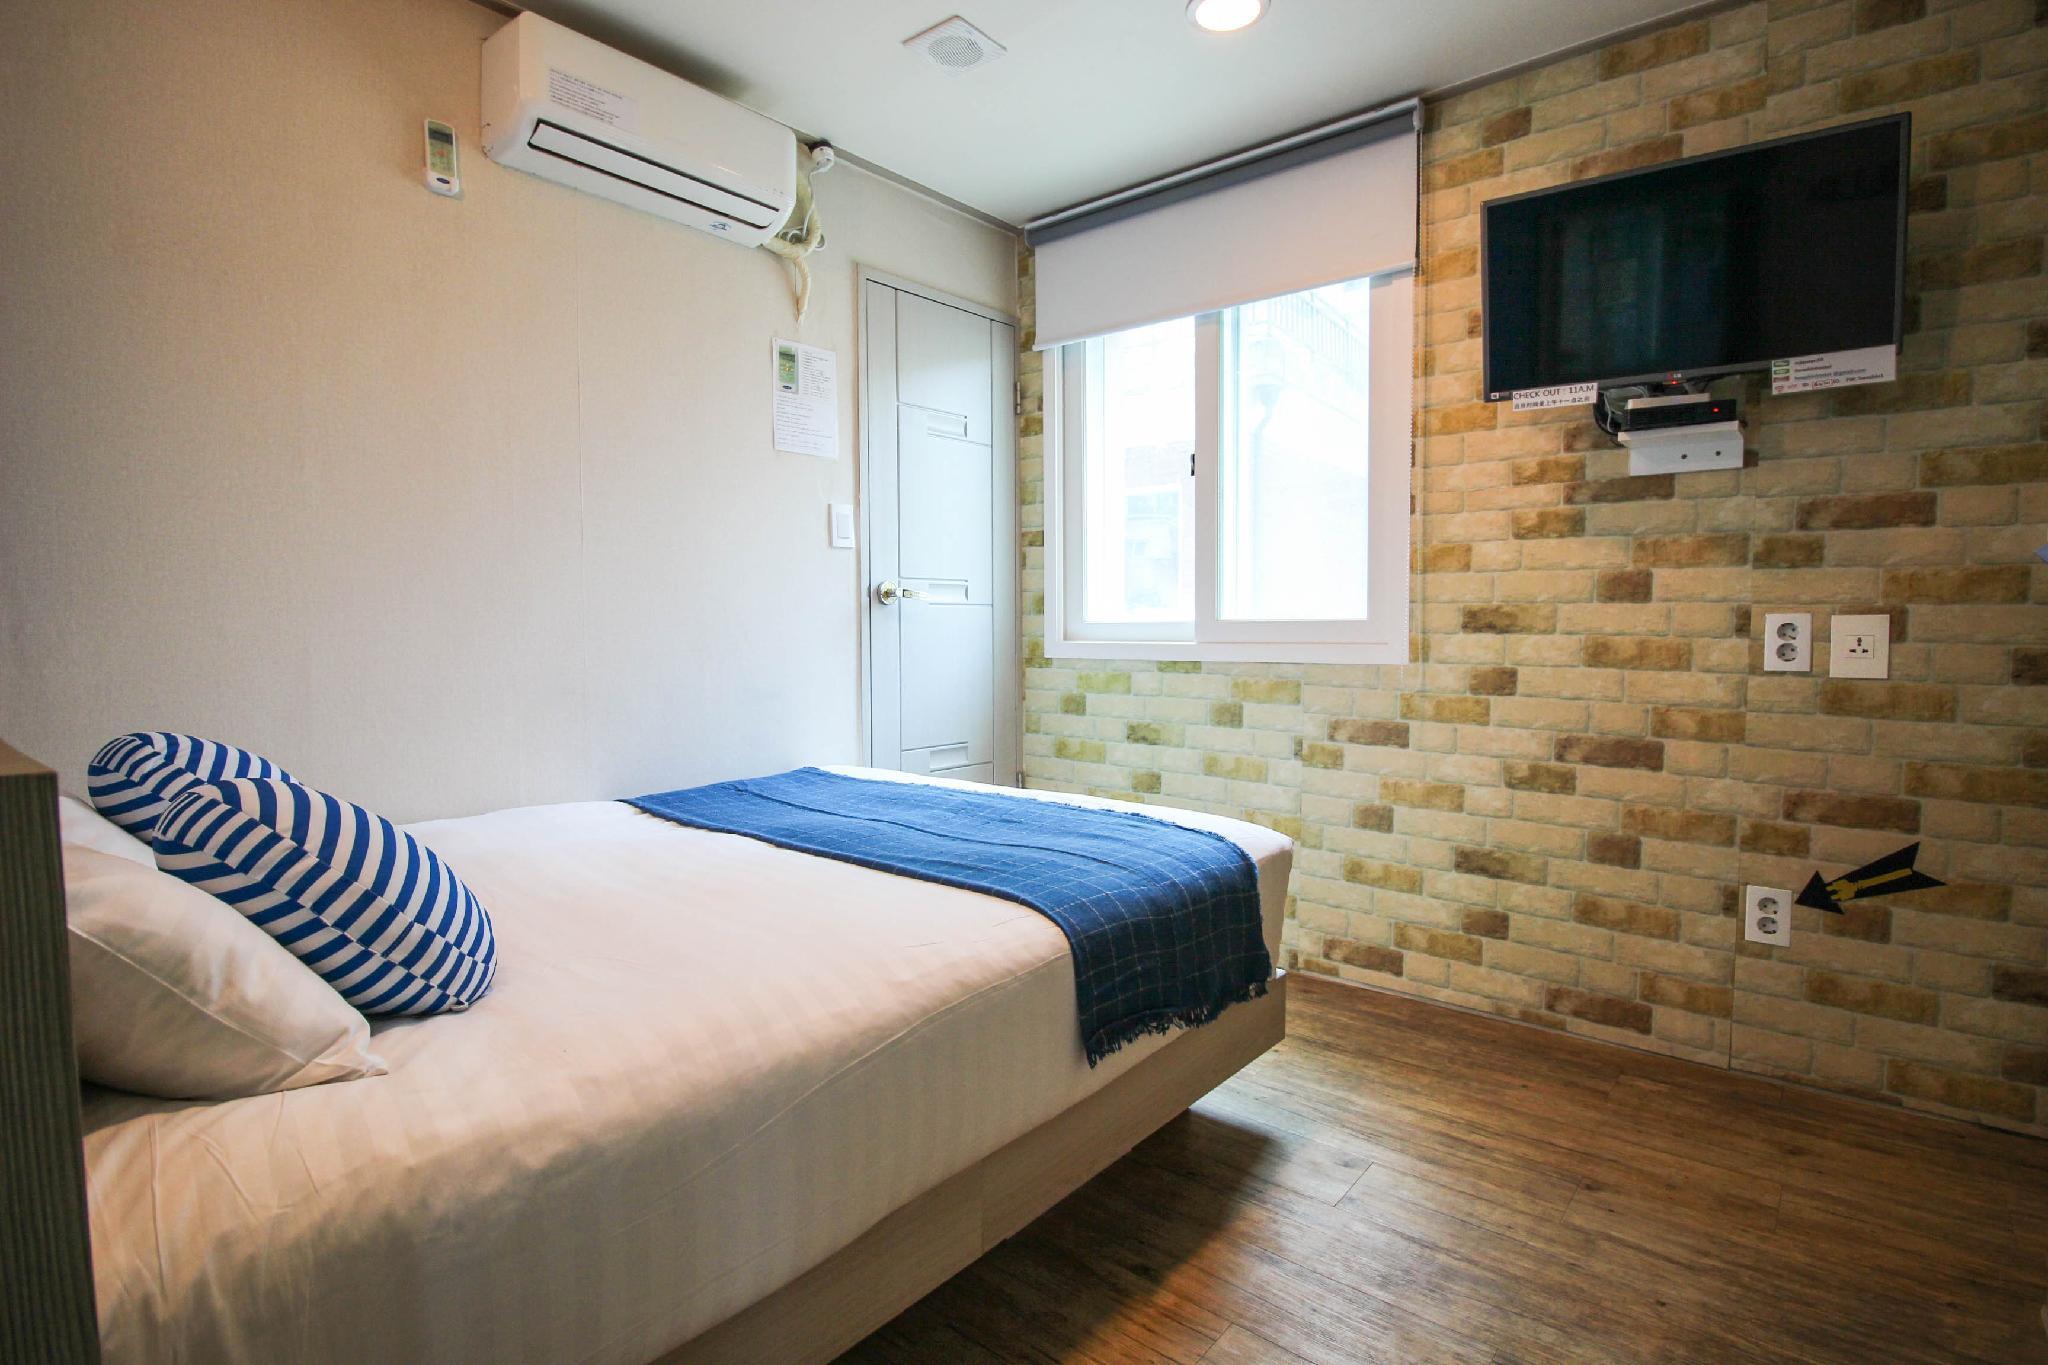 Dongdaemun Hwashin Hostel